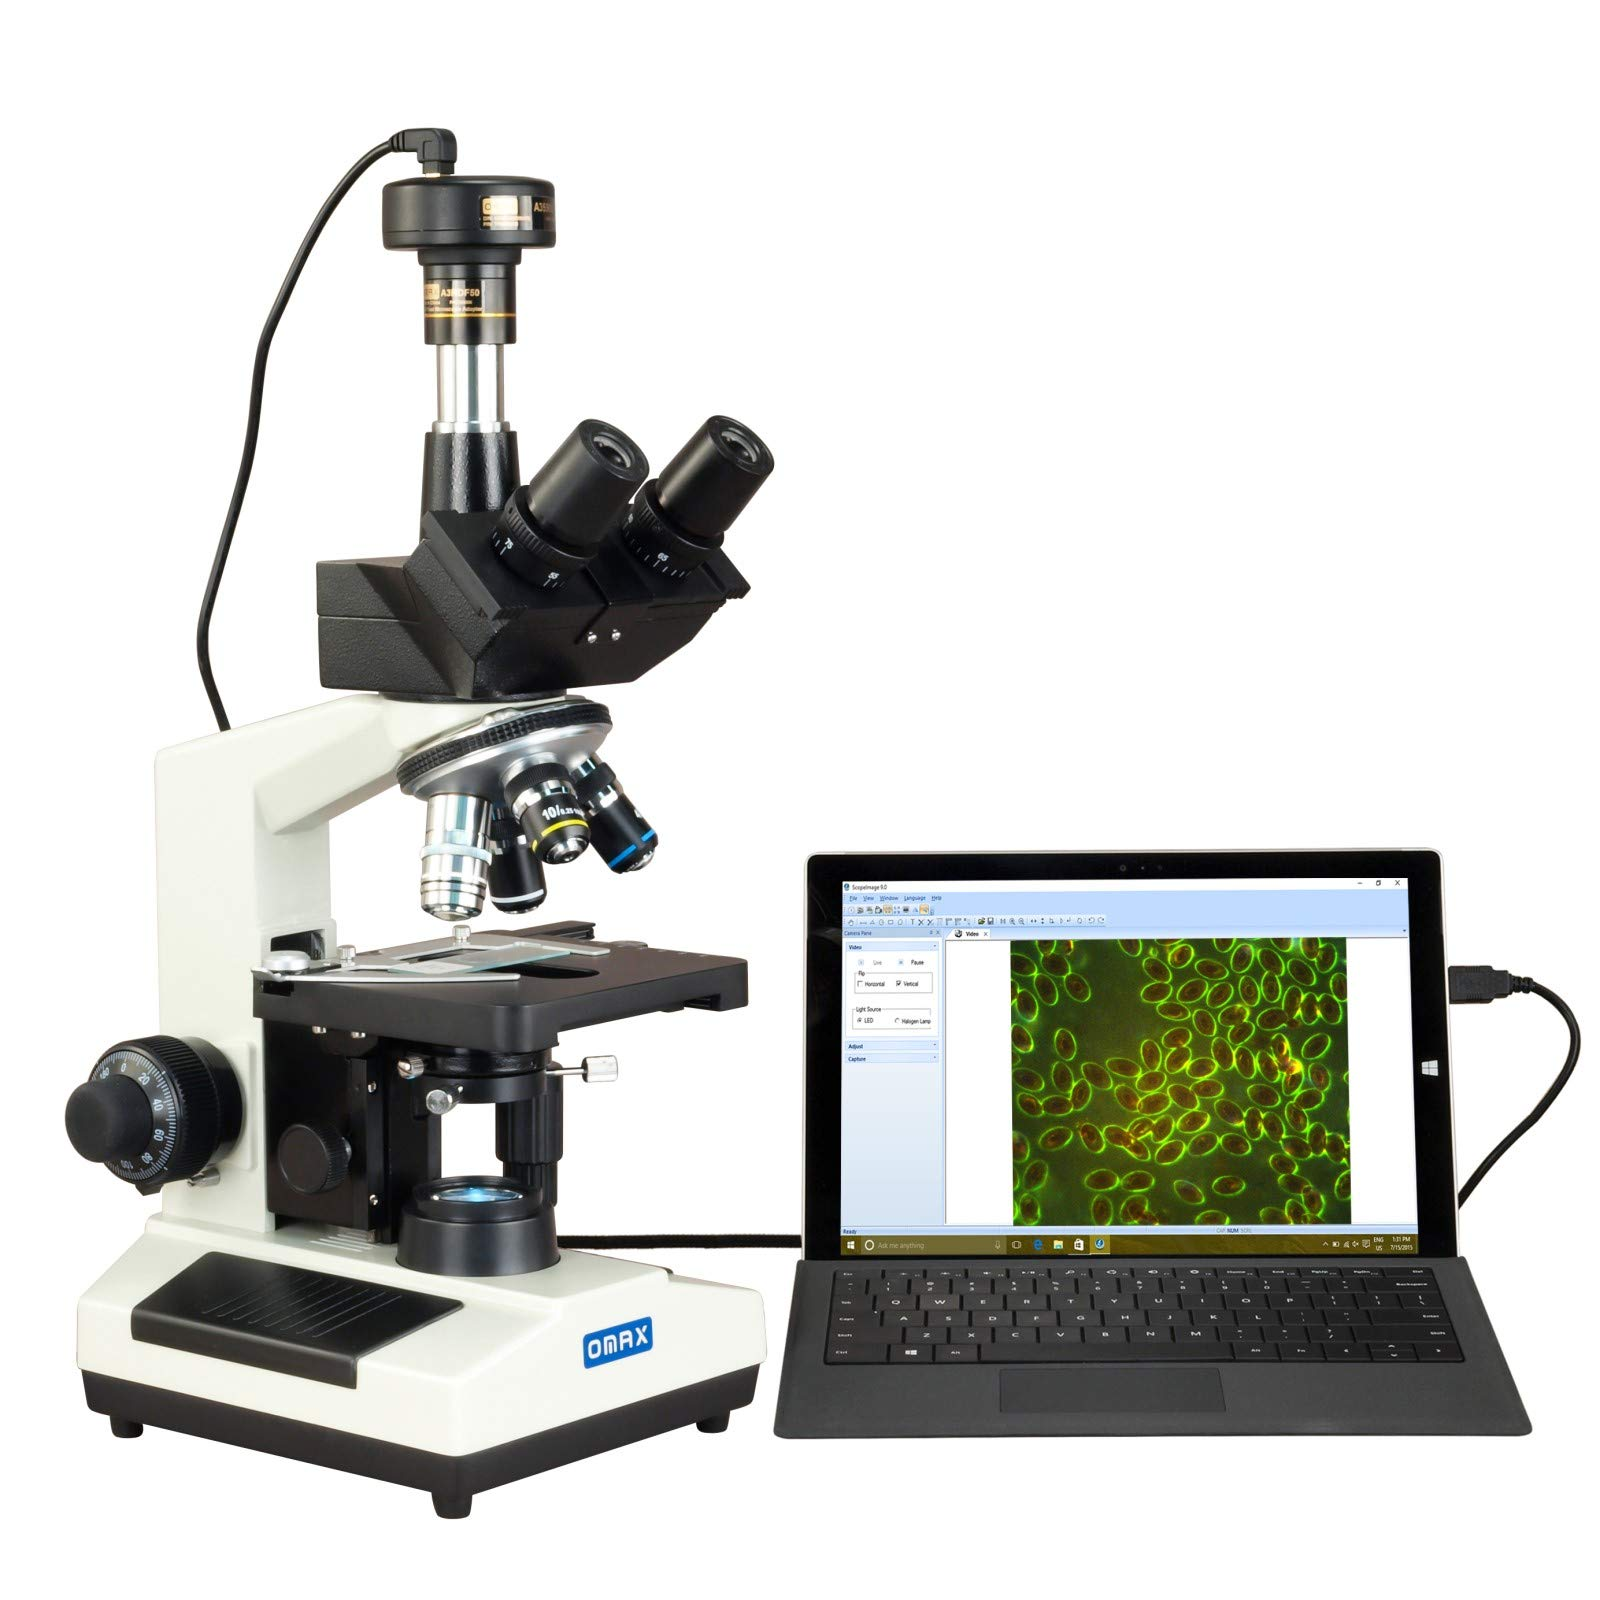 OMAX 40X-2000X Compound Advance Darkfield Trinocular LED Microscope with 5.0MP Digital Camera by OMAX